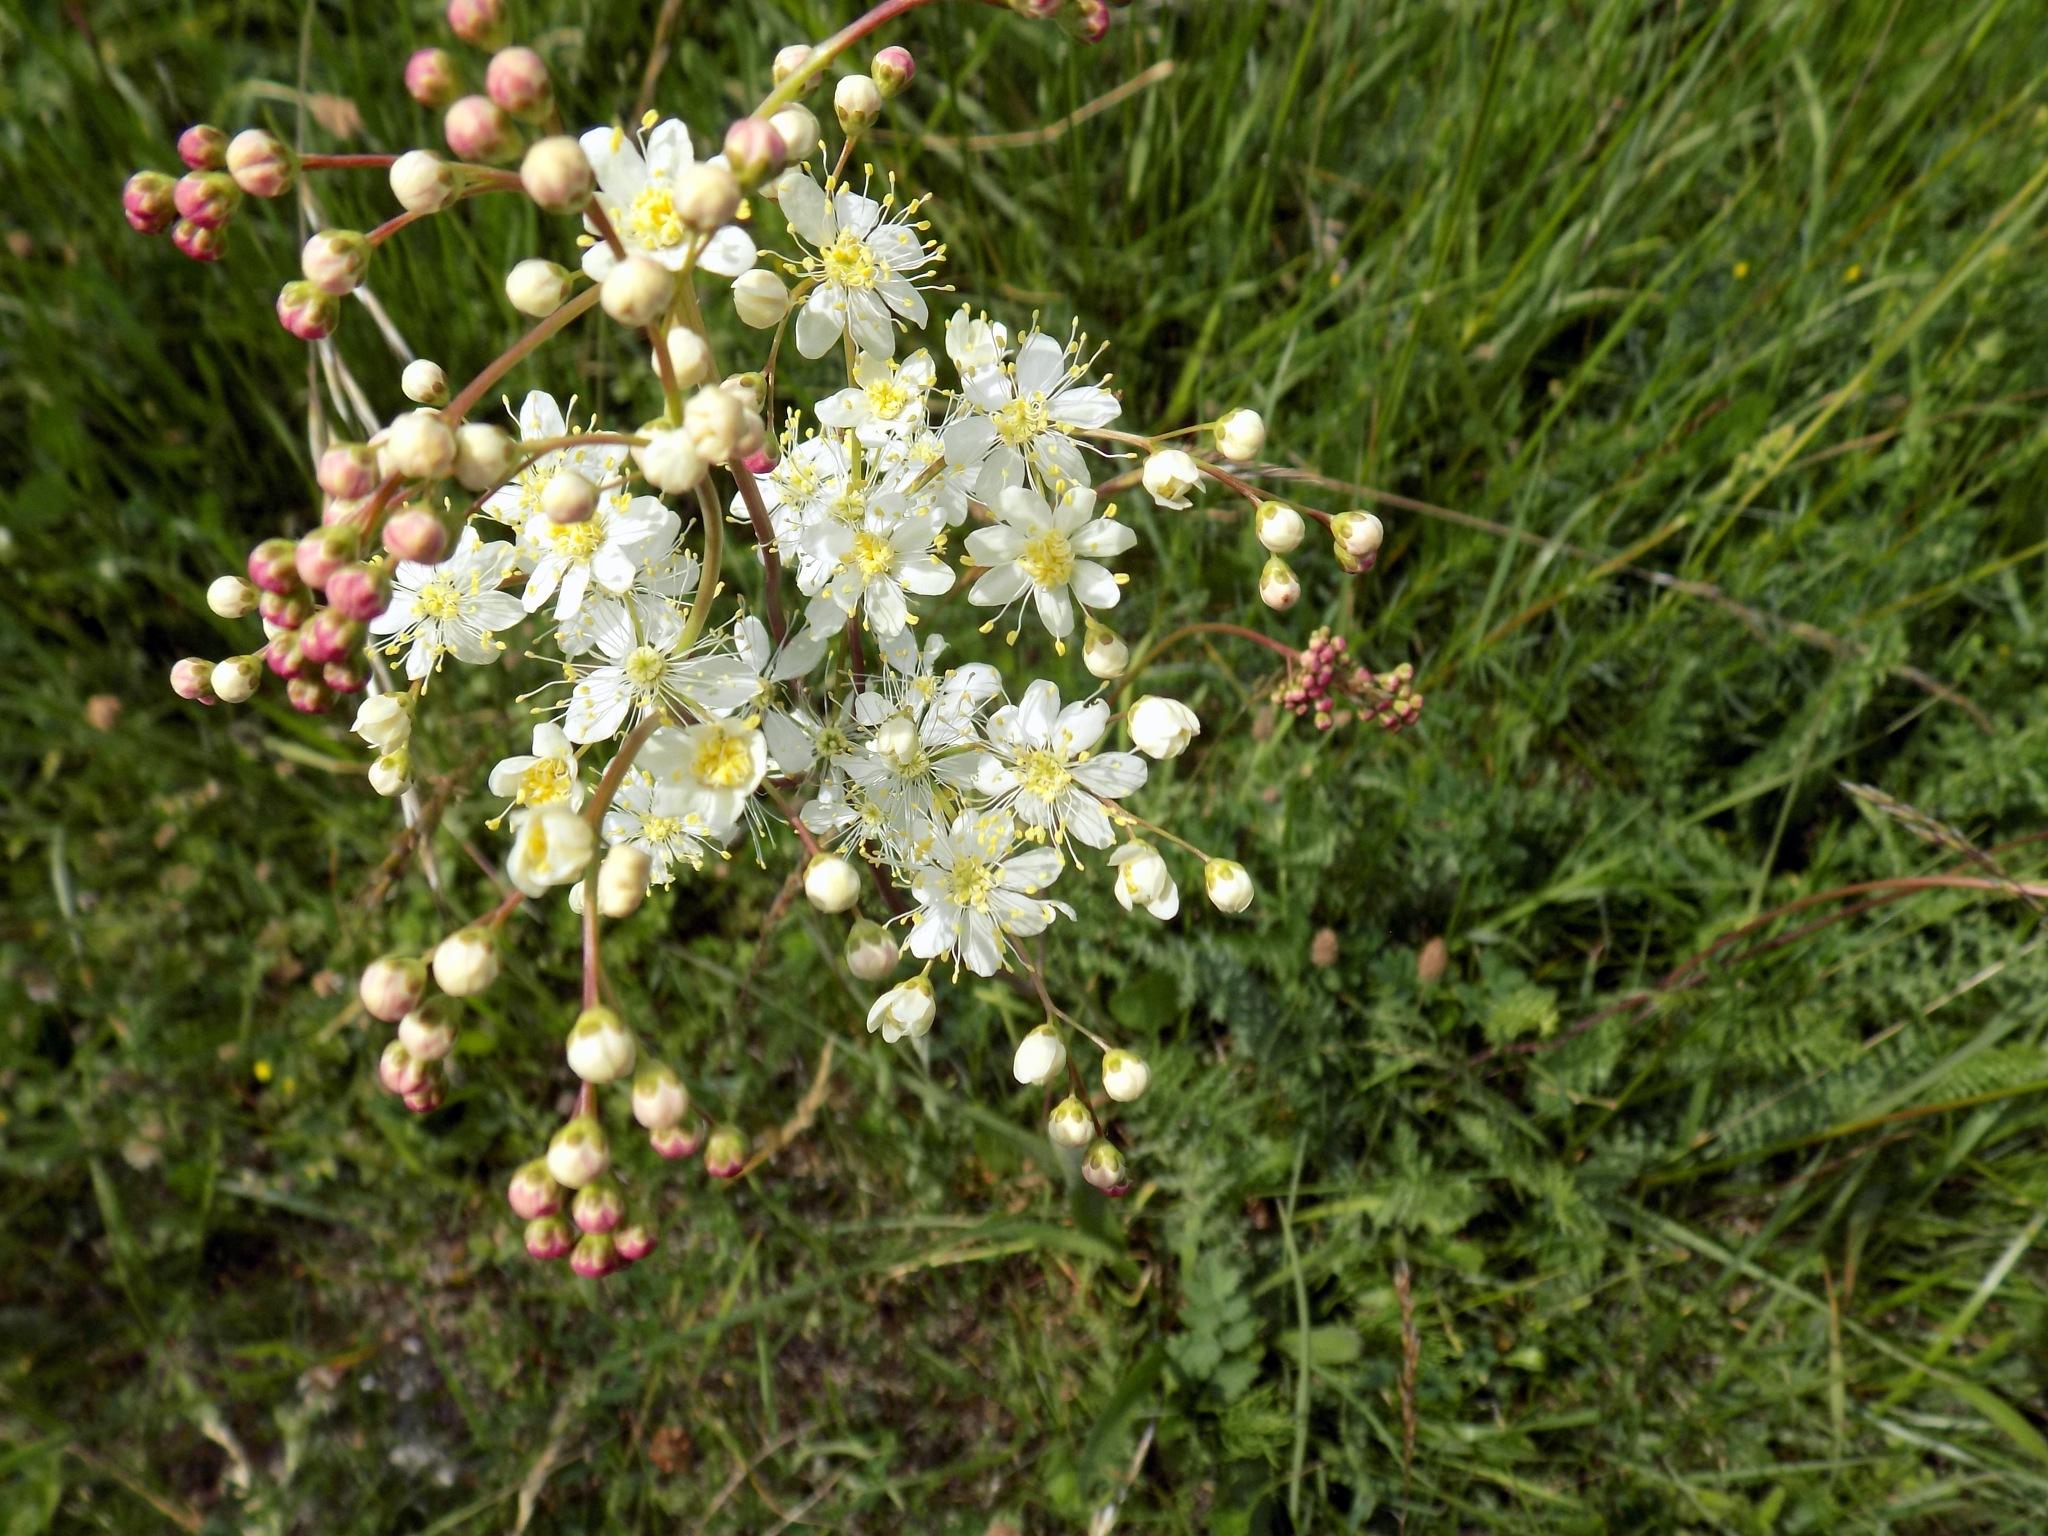 Meadows flowers. by uzkuraitiene62